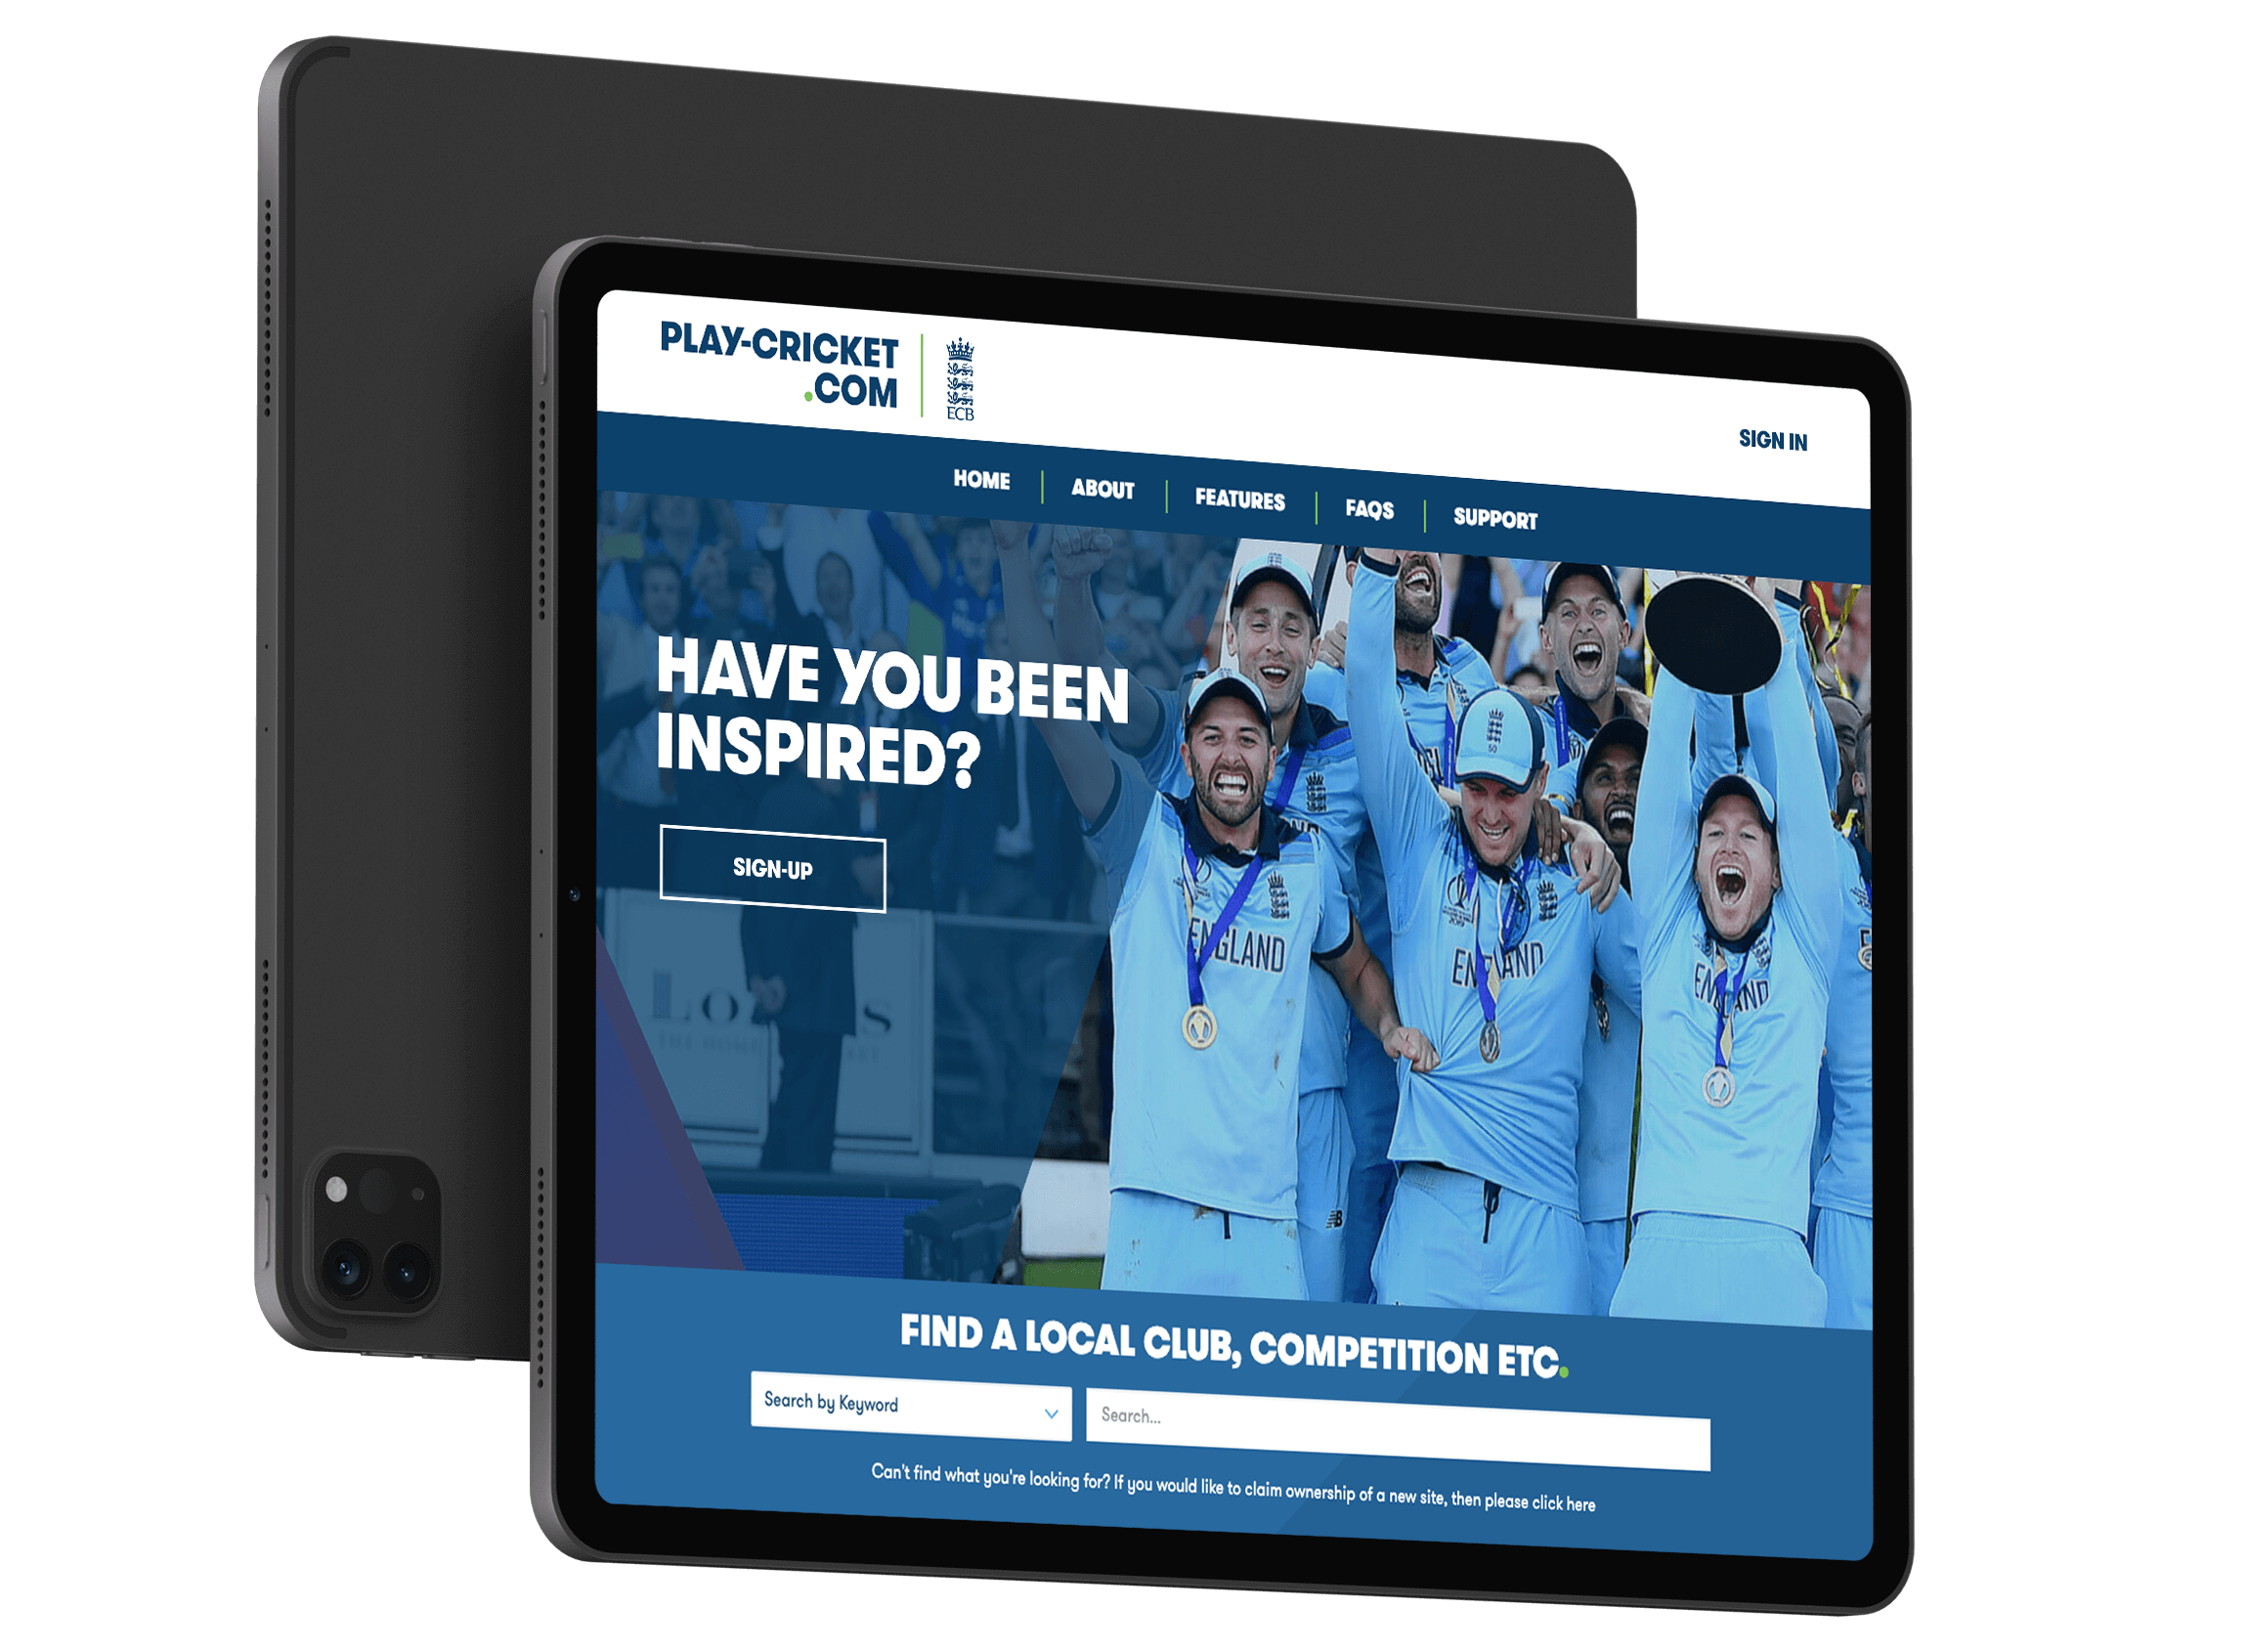 Play-cricket website design displayed on a tablet